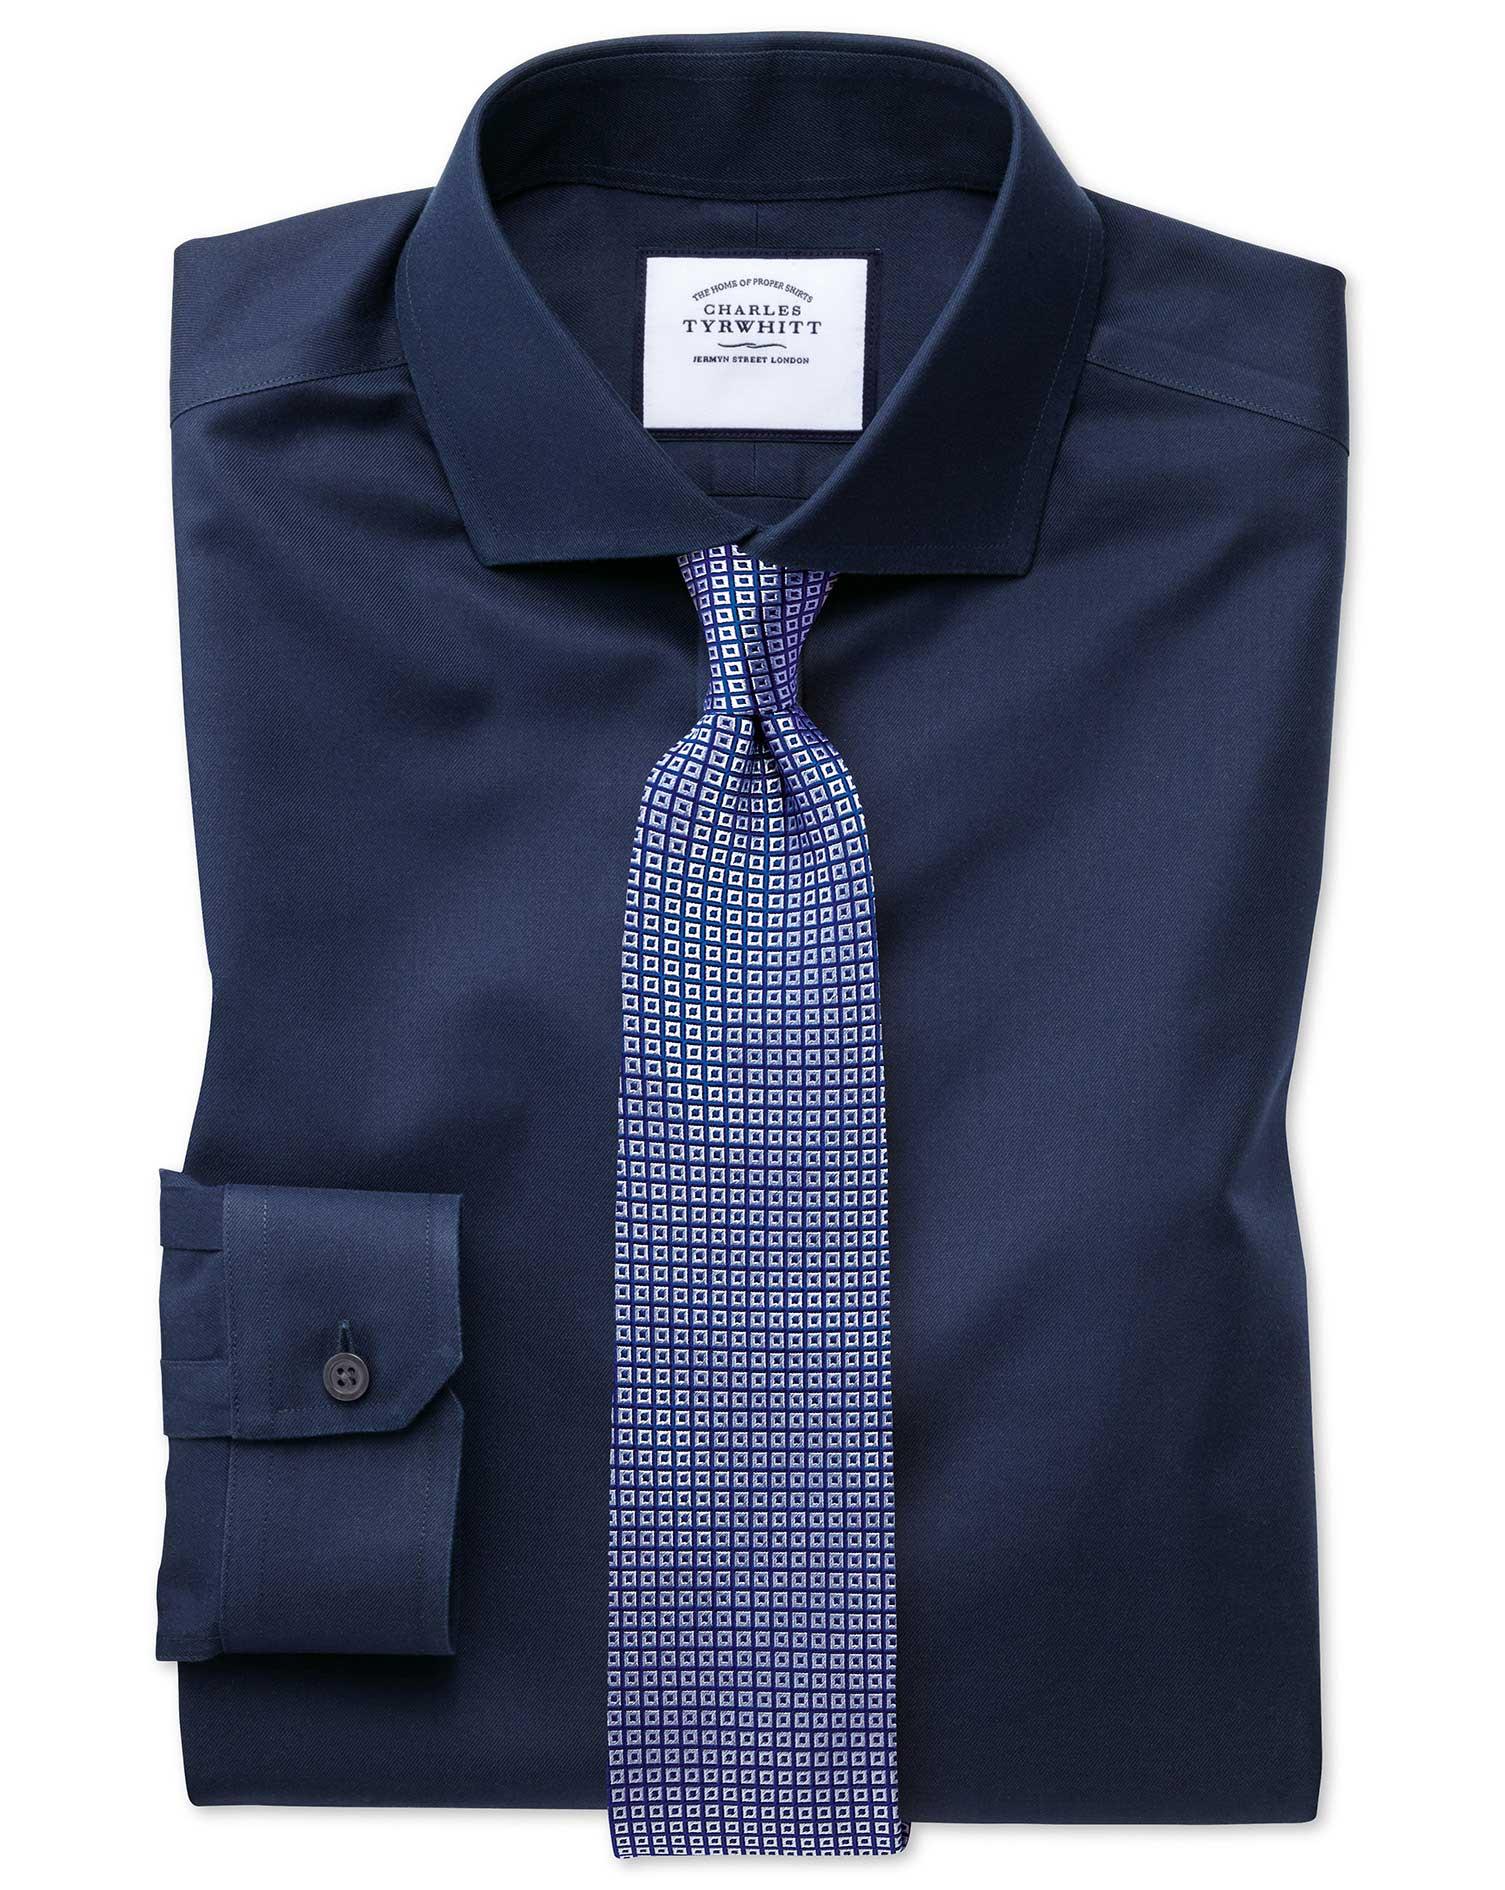 Super Slim Fit Navy Non-Iron Twill Cotton Formal Shirt Single Cuff Size 15.5/33 by Charles Tyrwhitt